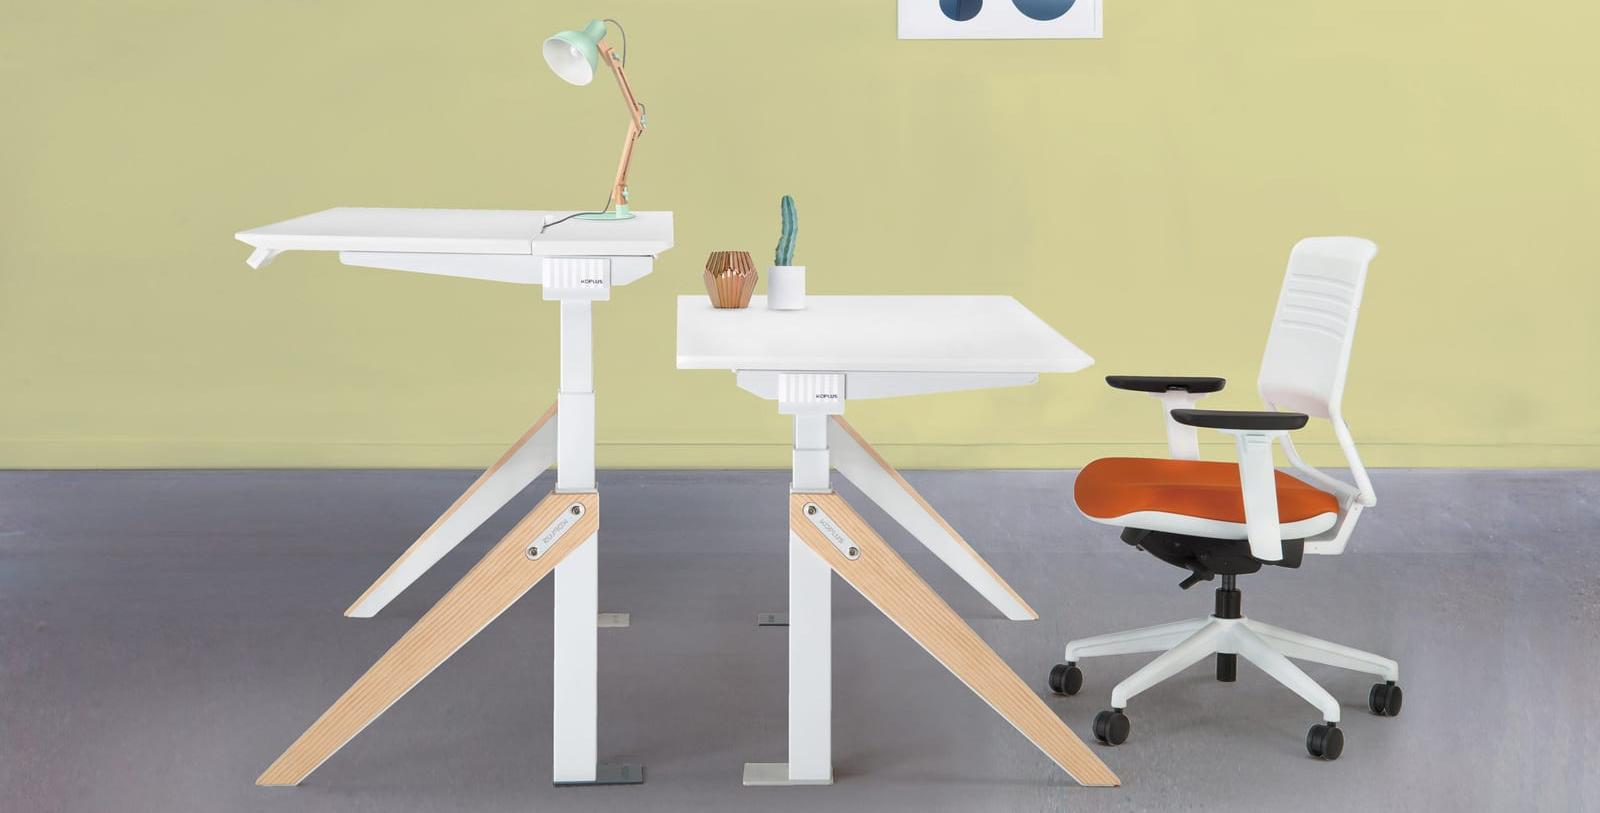 koplus-kin-sit-stand-desk-white-and-pine-in-situ-web.jpg